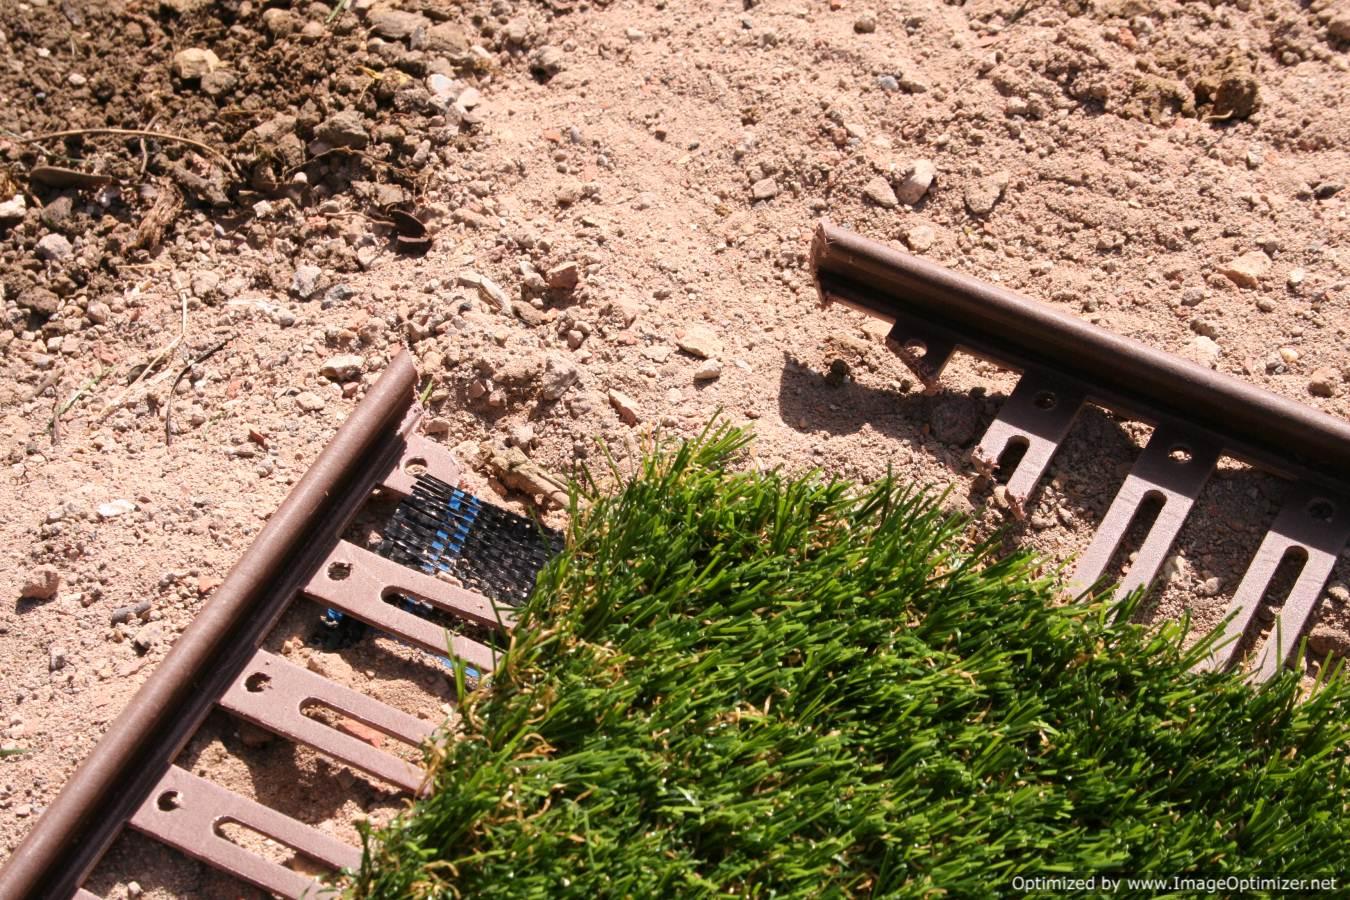 Unreal Gardens August 2011